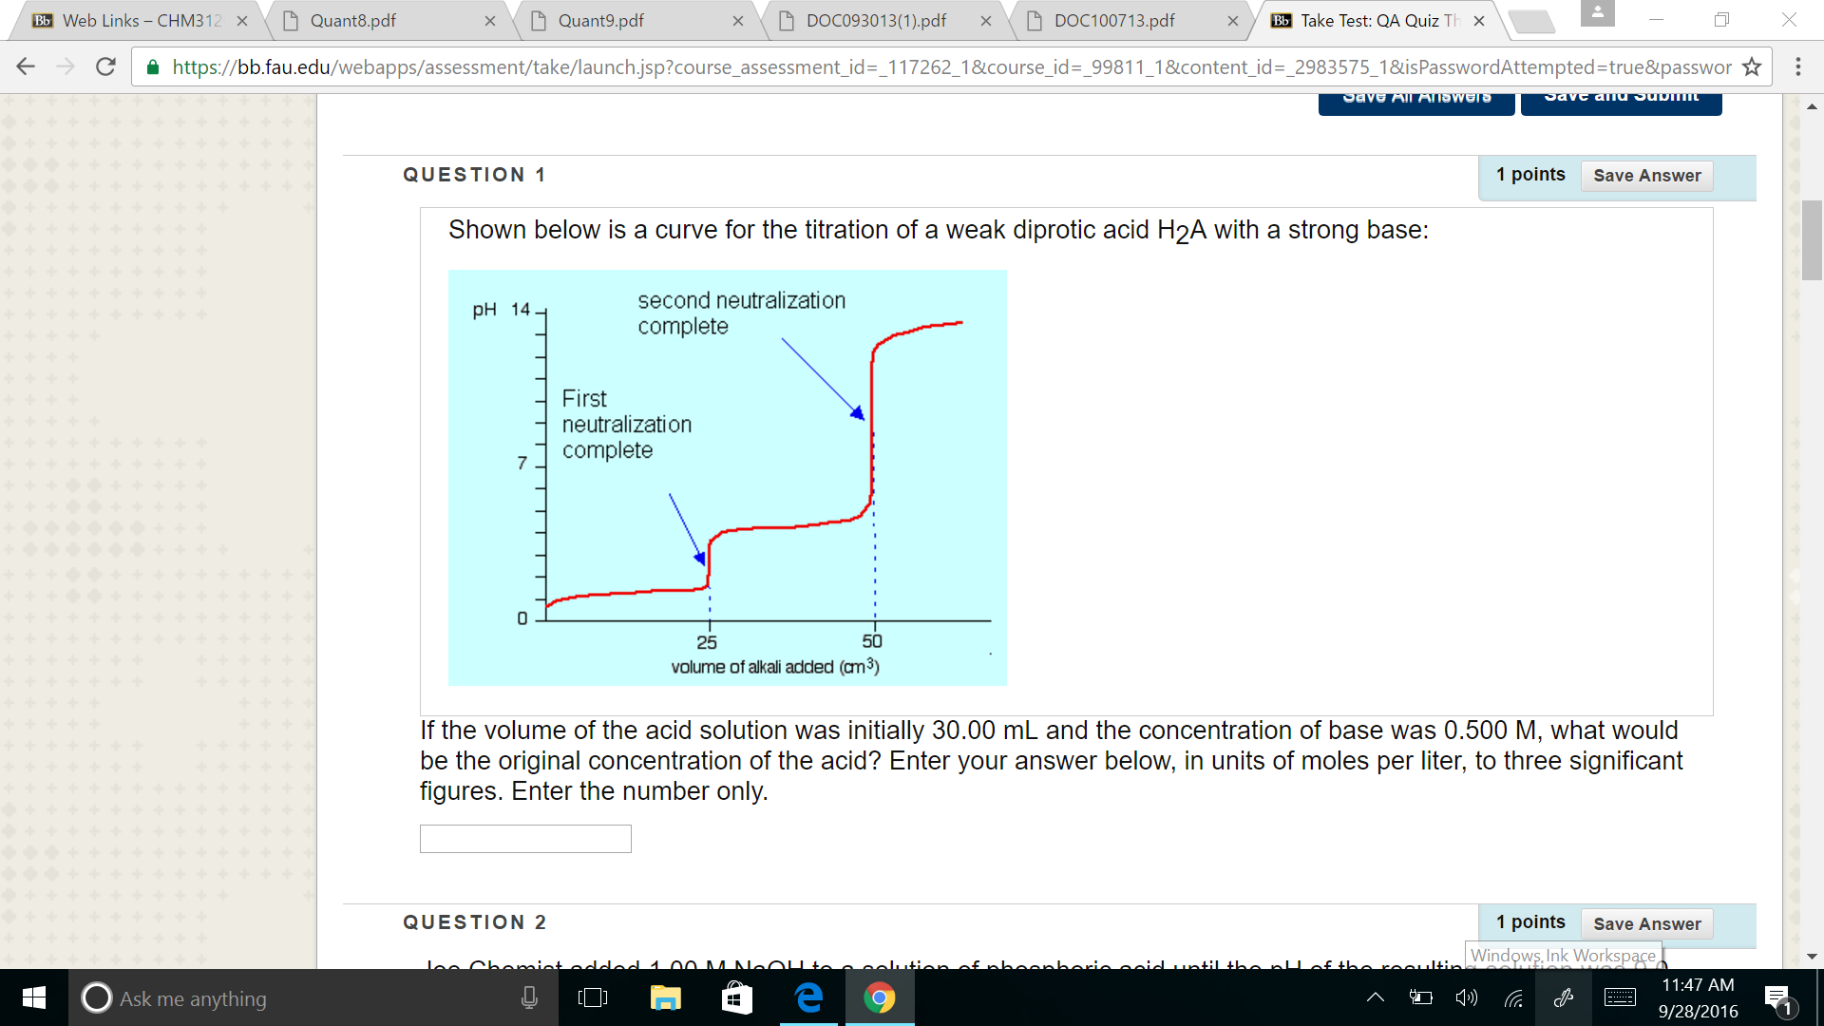 Solved D Quant 9 Pdf Bb Web Links Chm3 X D Quant8 Pdf X D